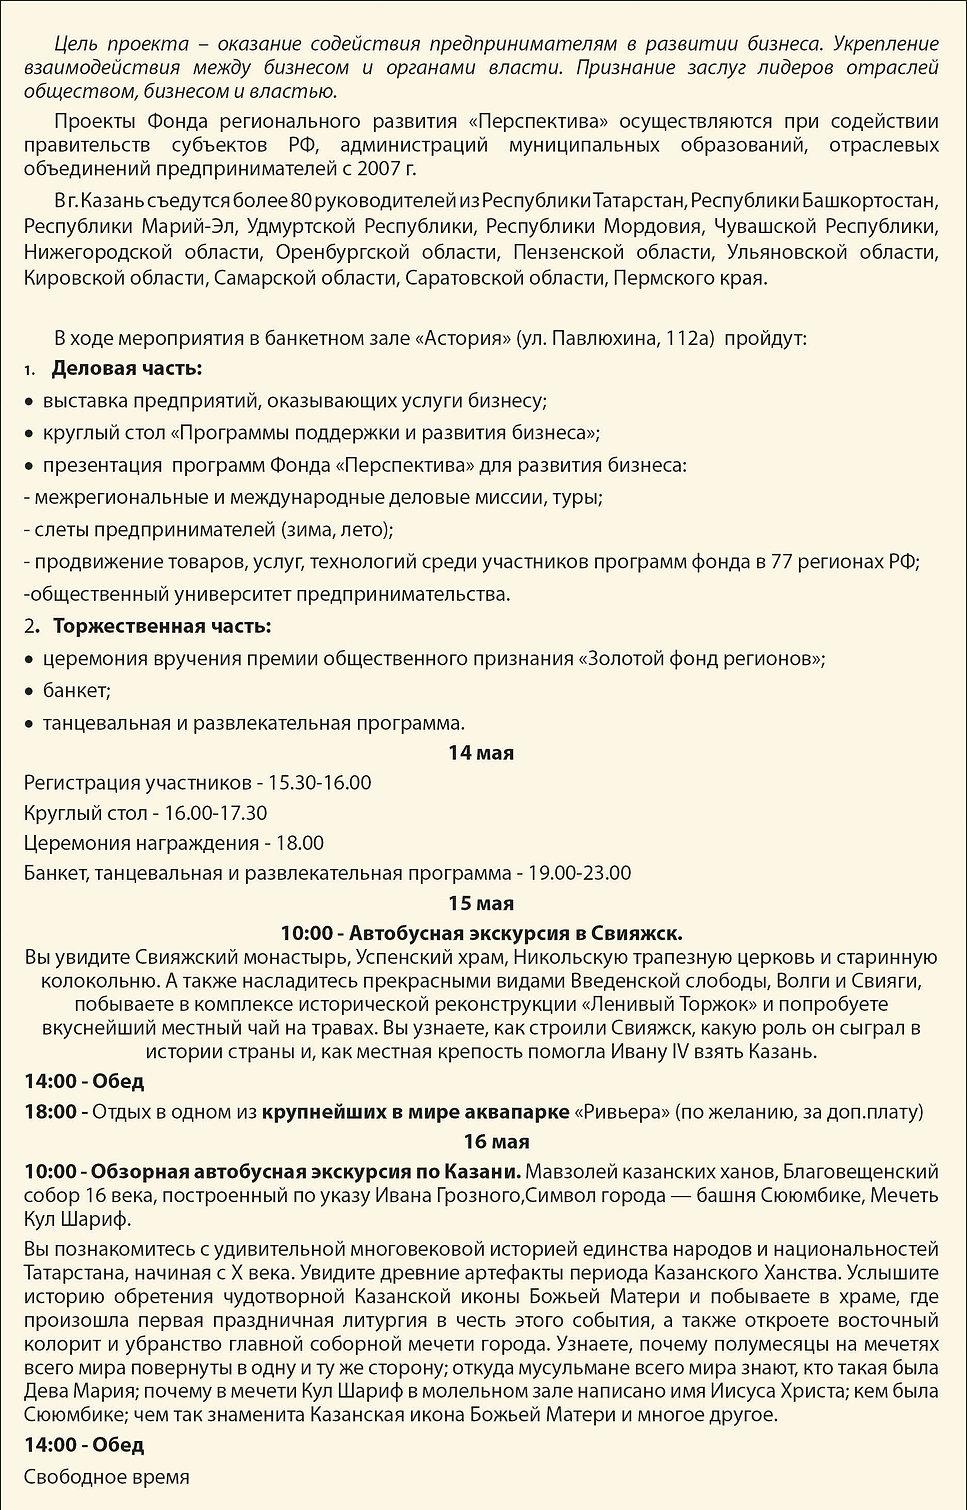 Анонс Казань.jpg